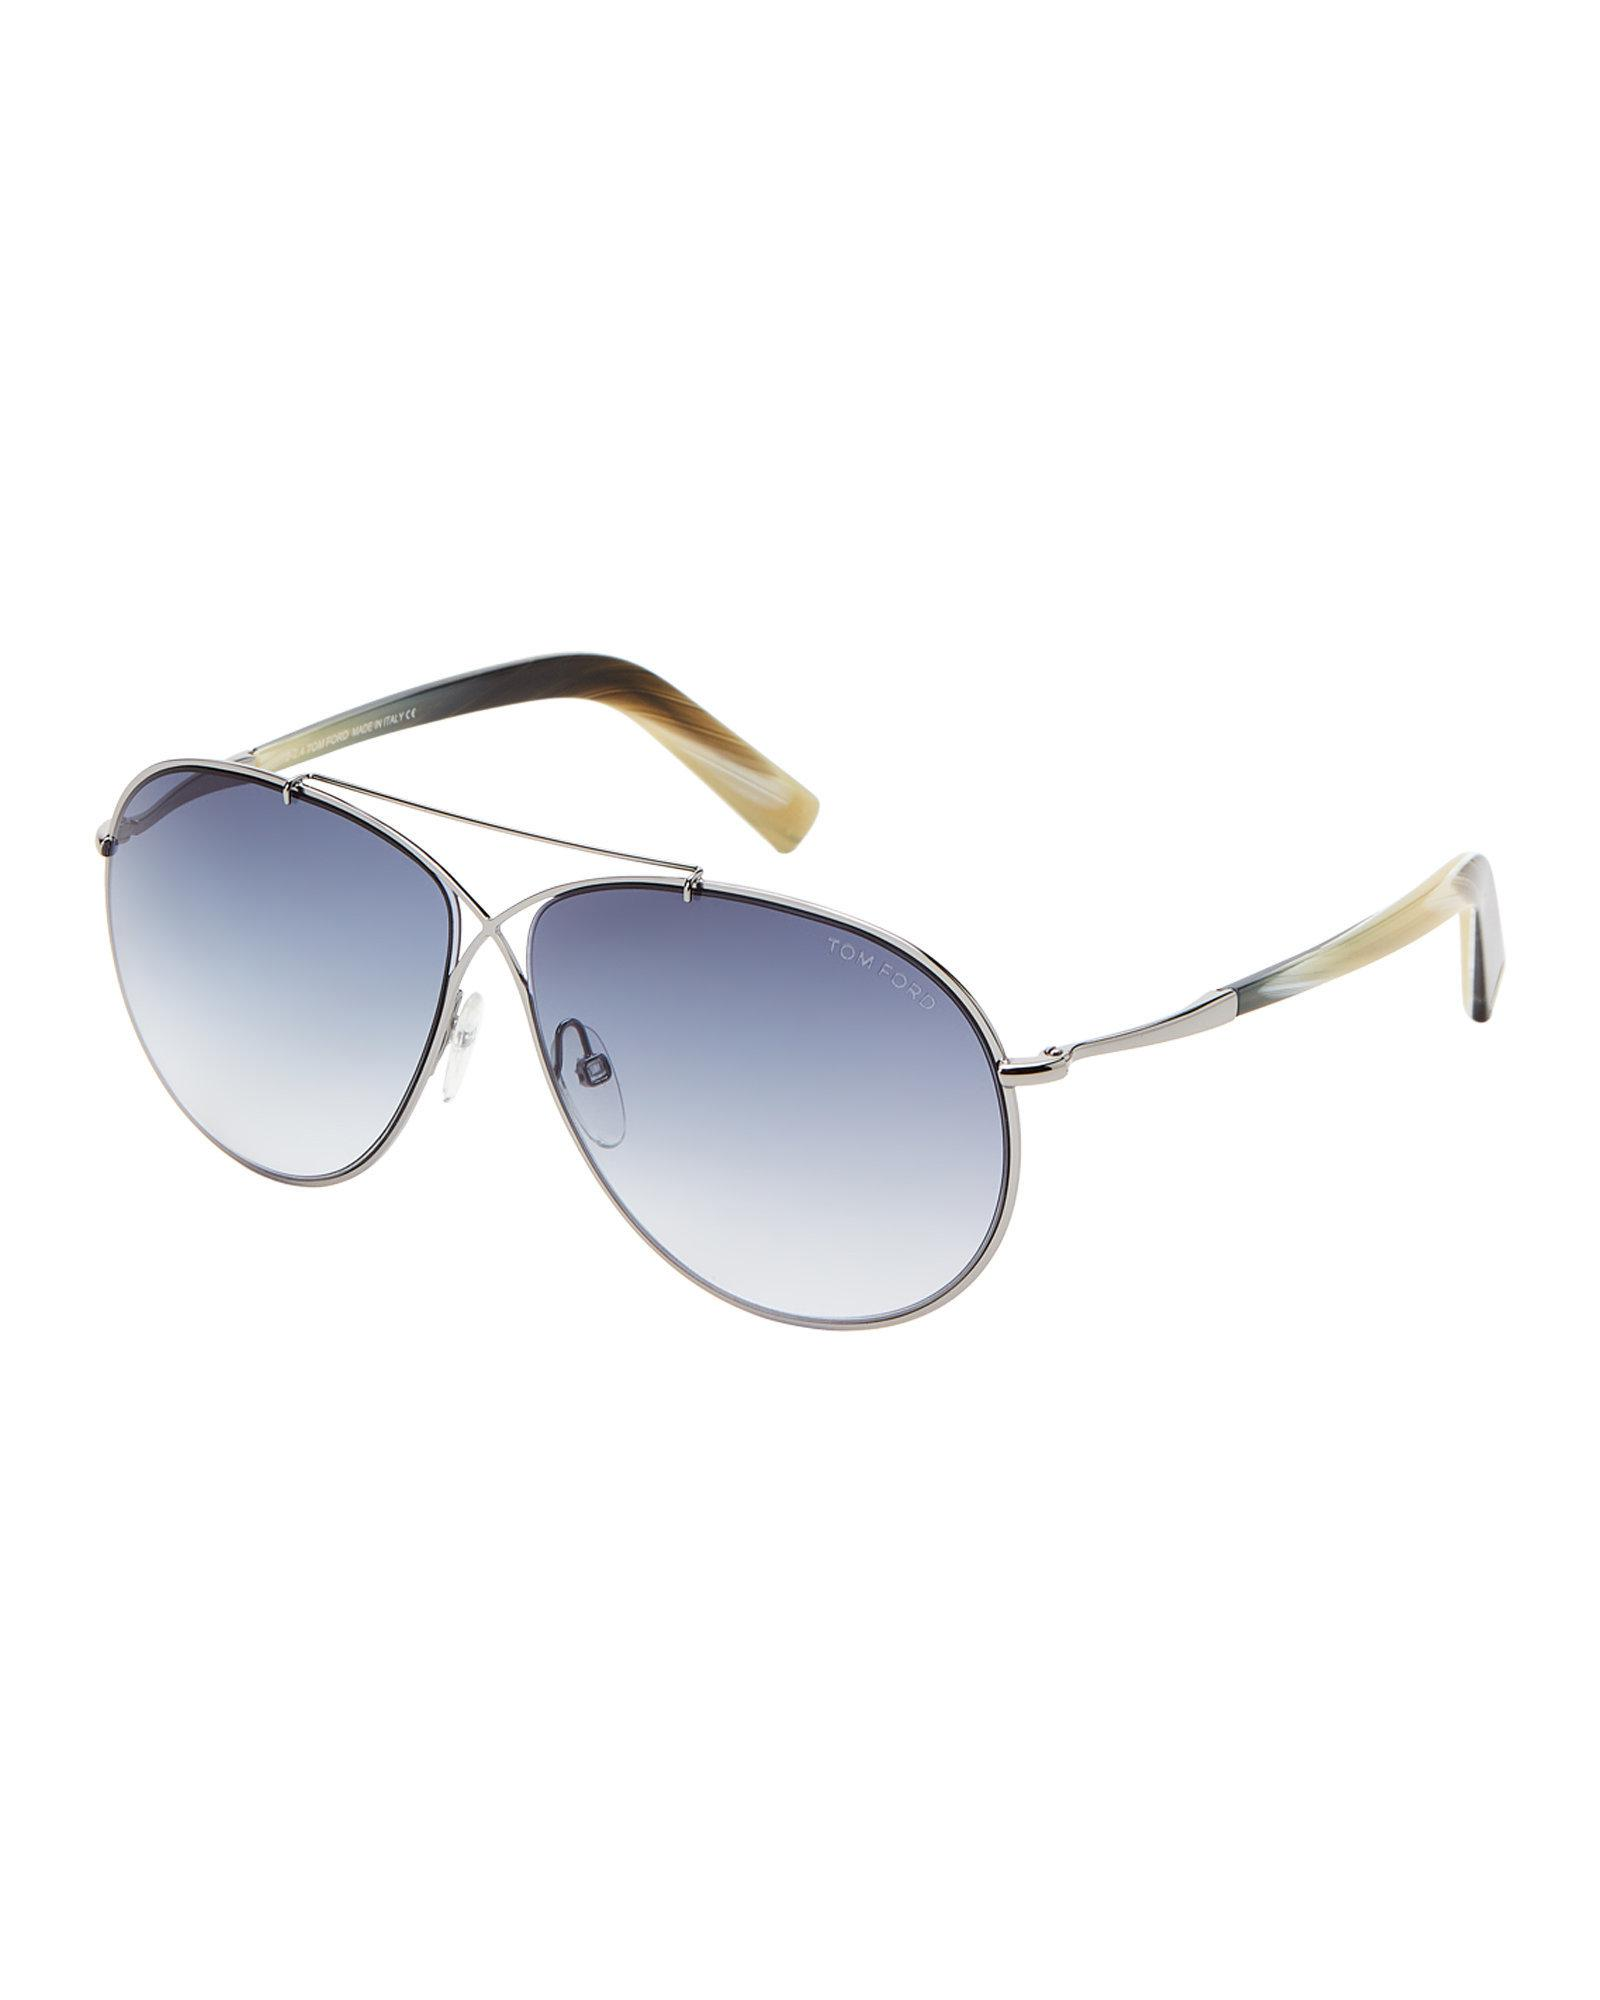 b6398c95a283f Lyst - Tom Ford Tf374 Rhodium-tone Eva Aviator Sunglasses in Blue